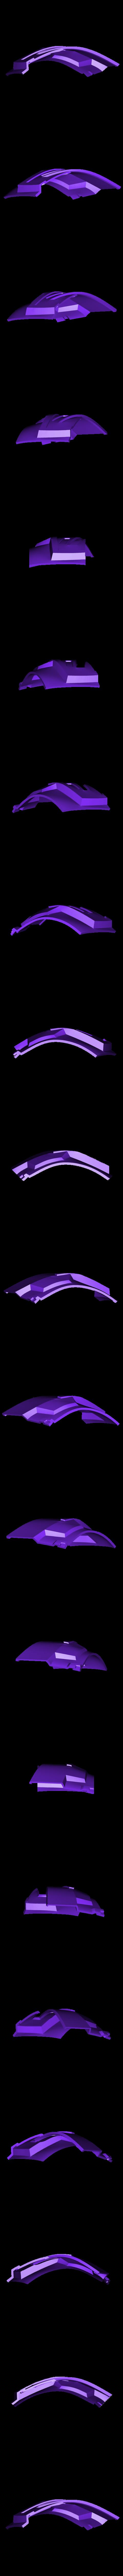 Part_2_v4.stl Download free STL file  Blood Dragon Helmet Mass Effect 2 (With Back Access) • 3D printable template, VillainousPropShop